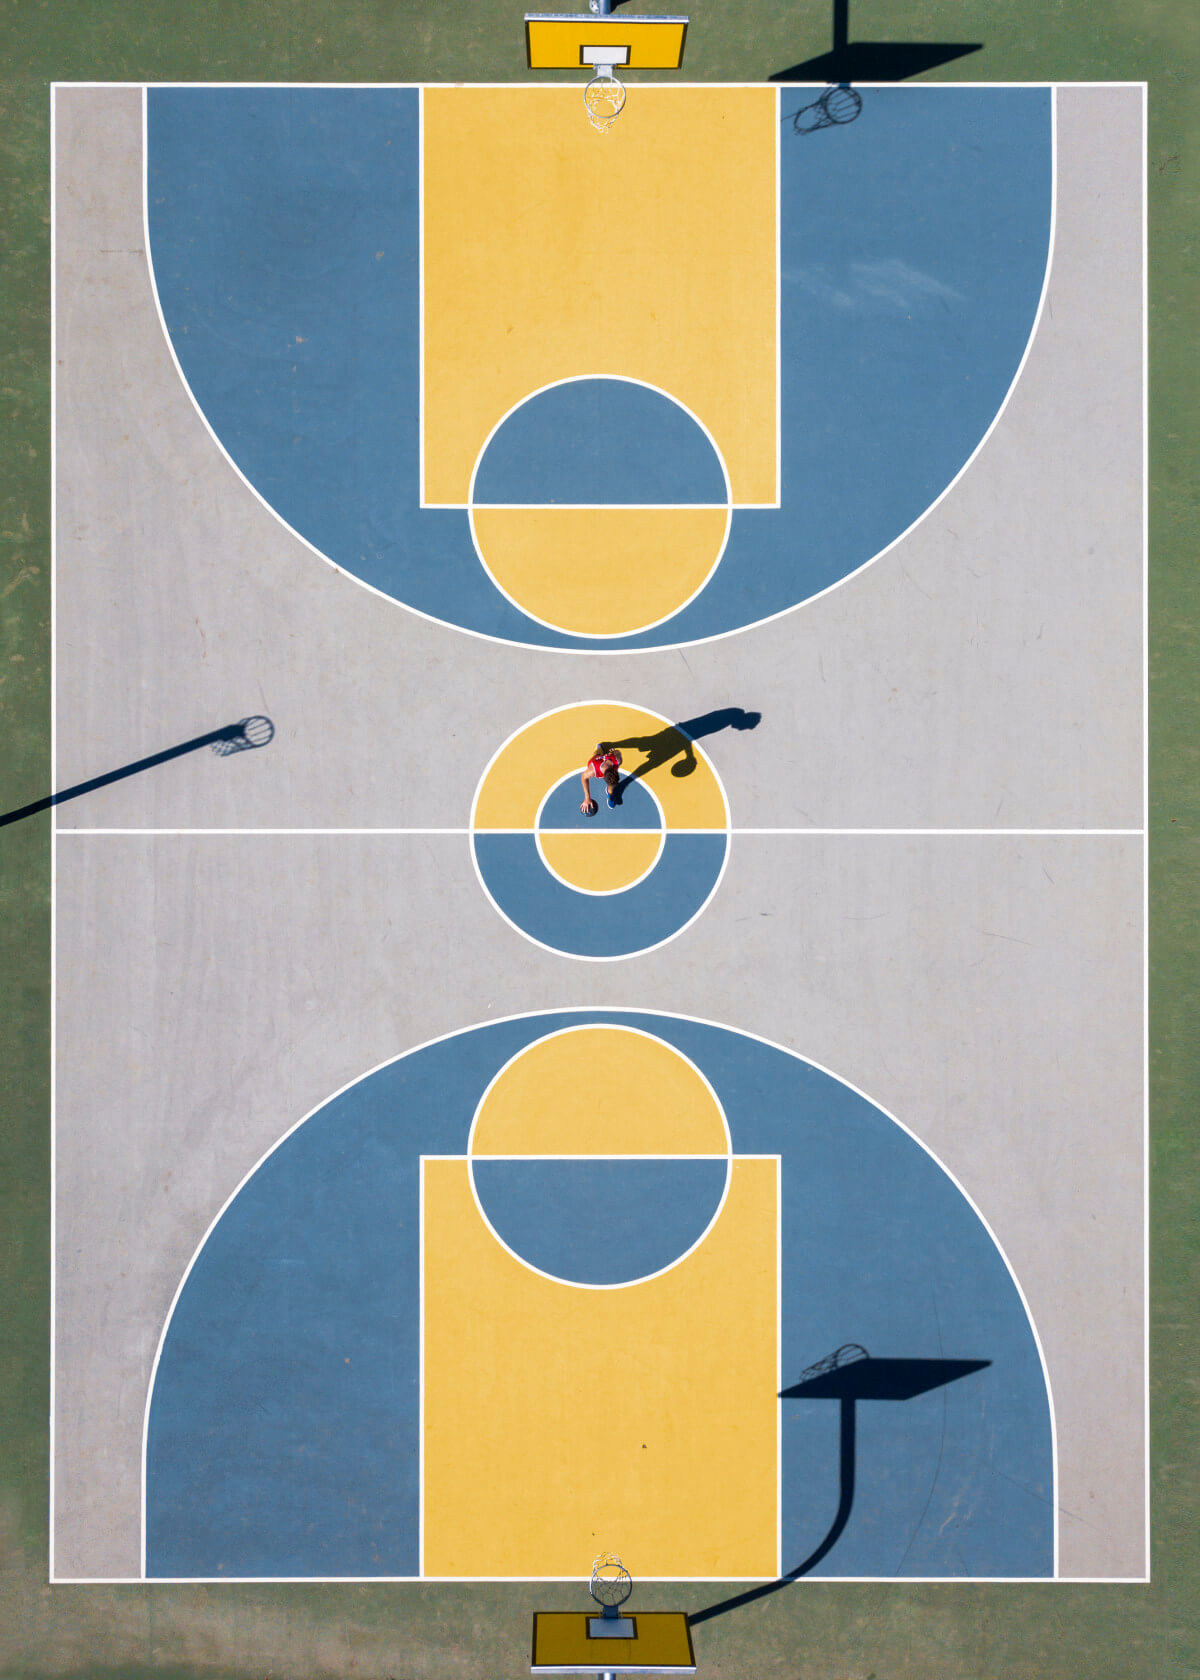 droni-dji-instagram-11